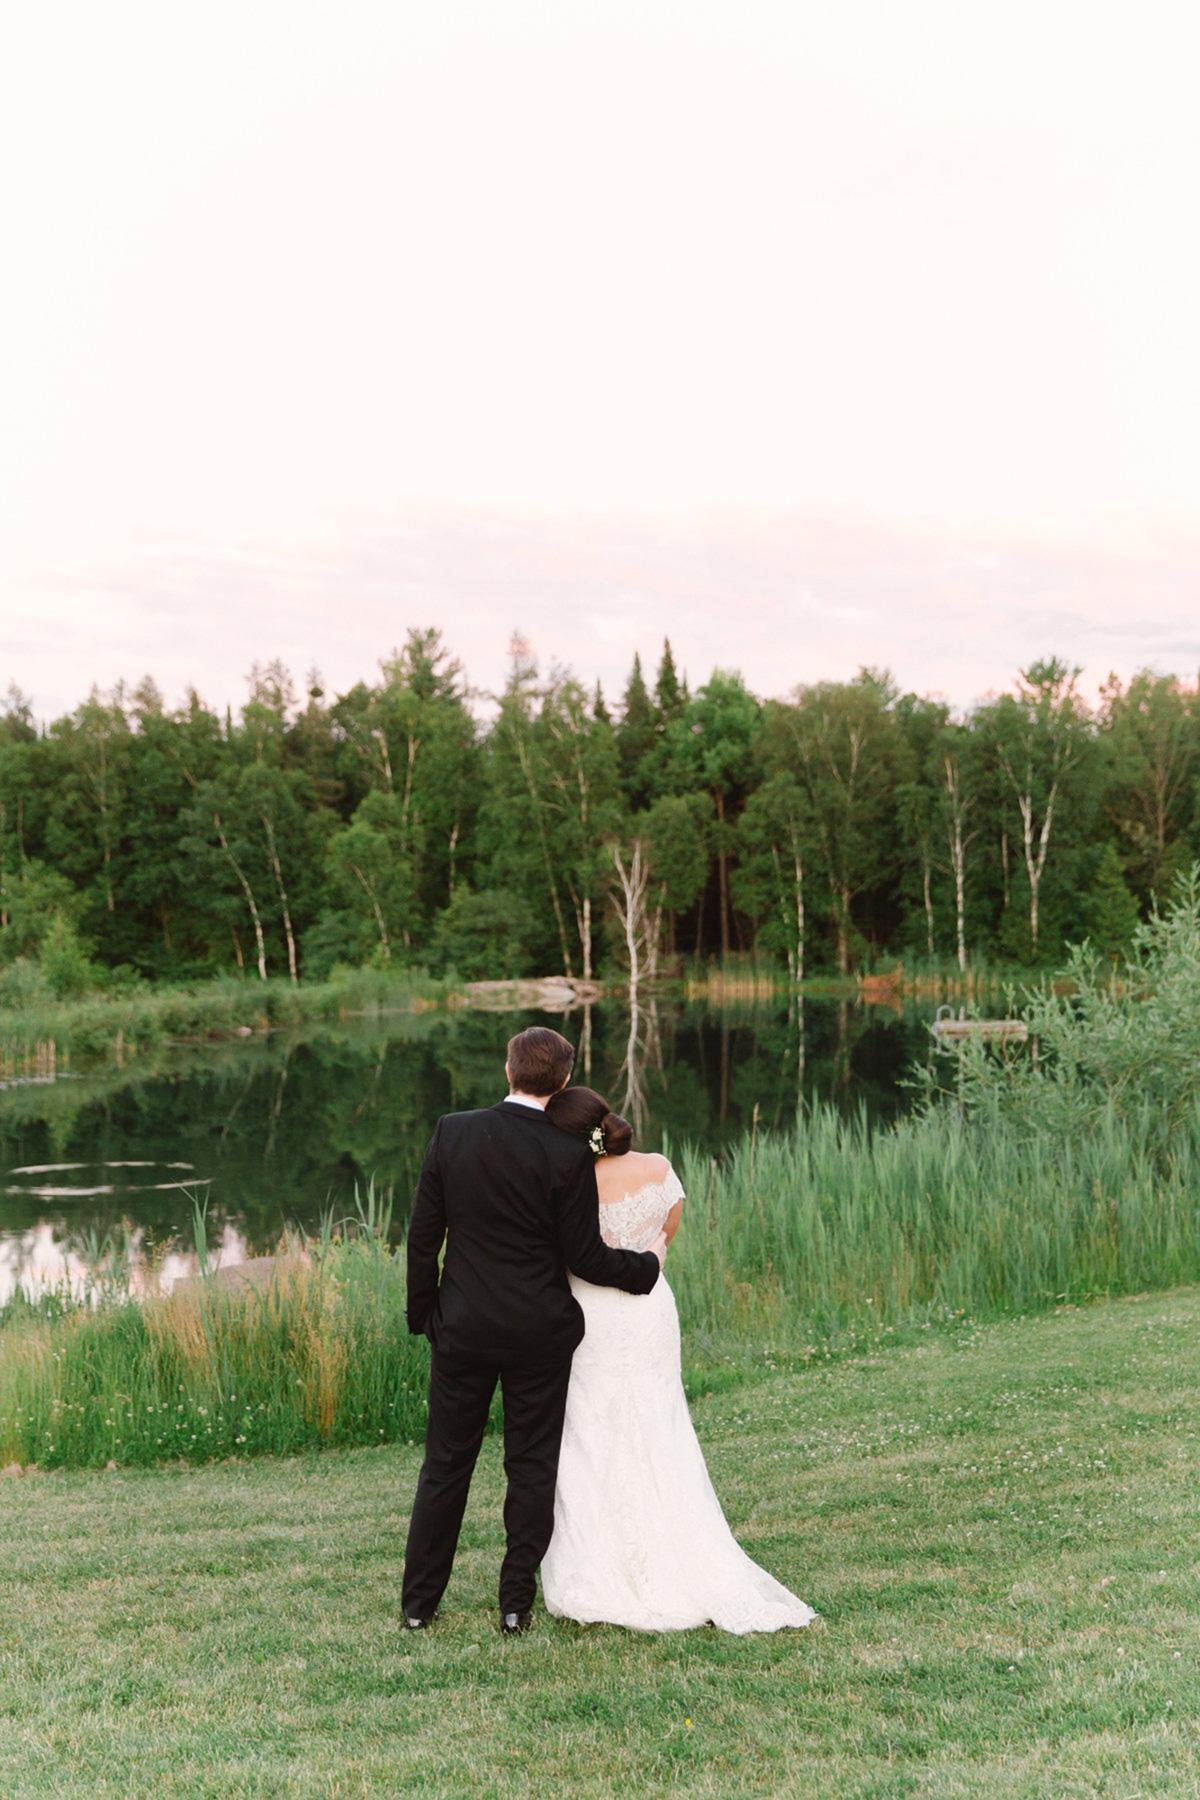 artiese-studios-vineyard-bride-swish-list-private-estate-cambridge-wedding-14.jpg